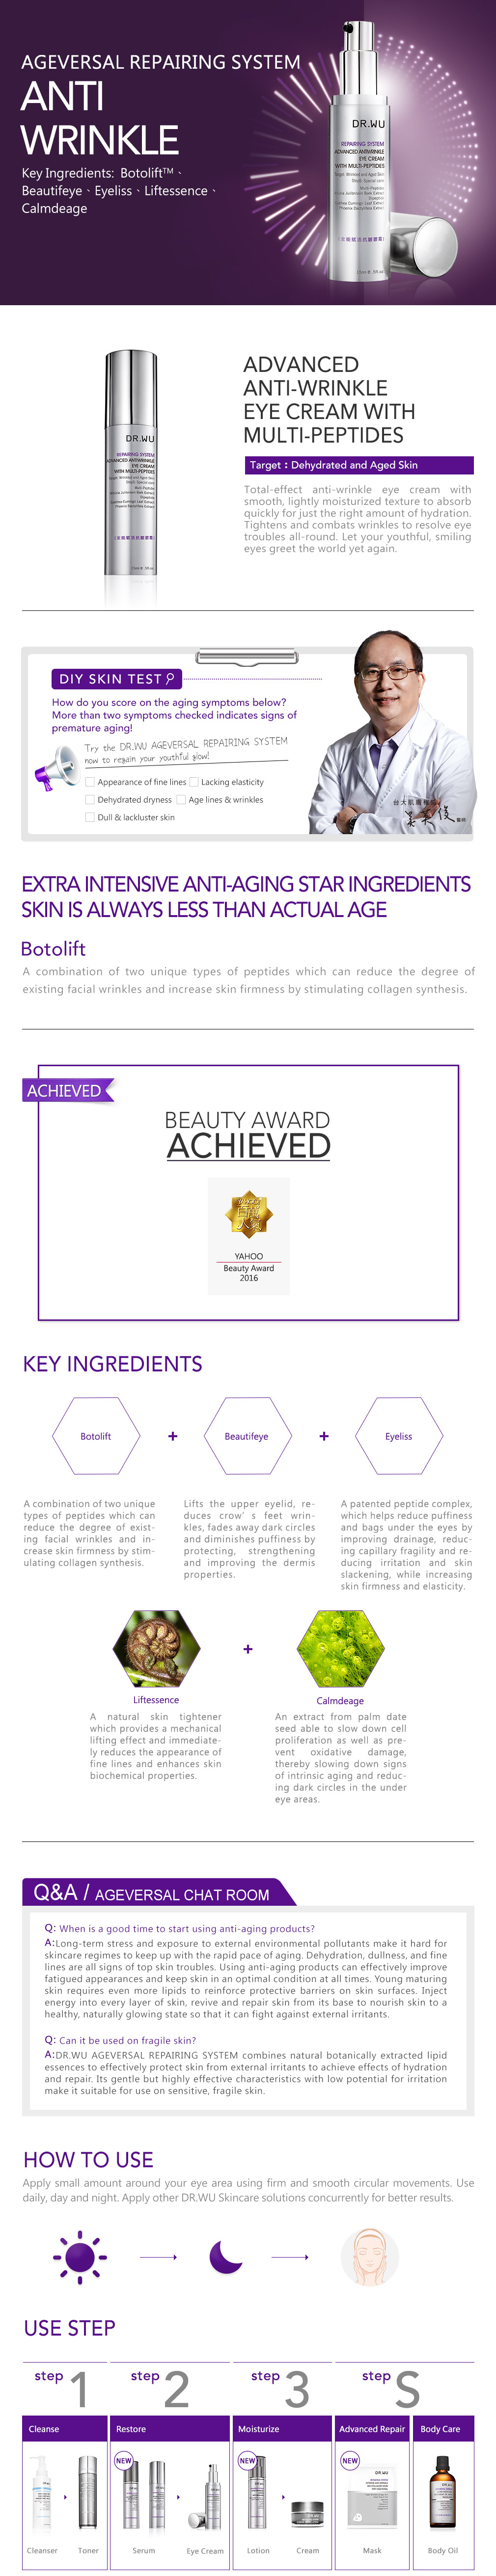 Advanced Anti-Wrinkle Eye Cream - Features